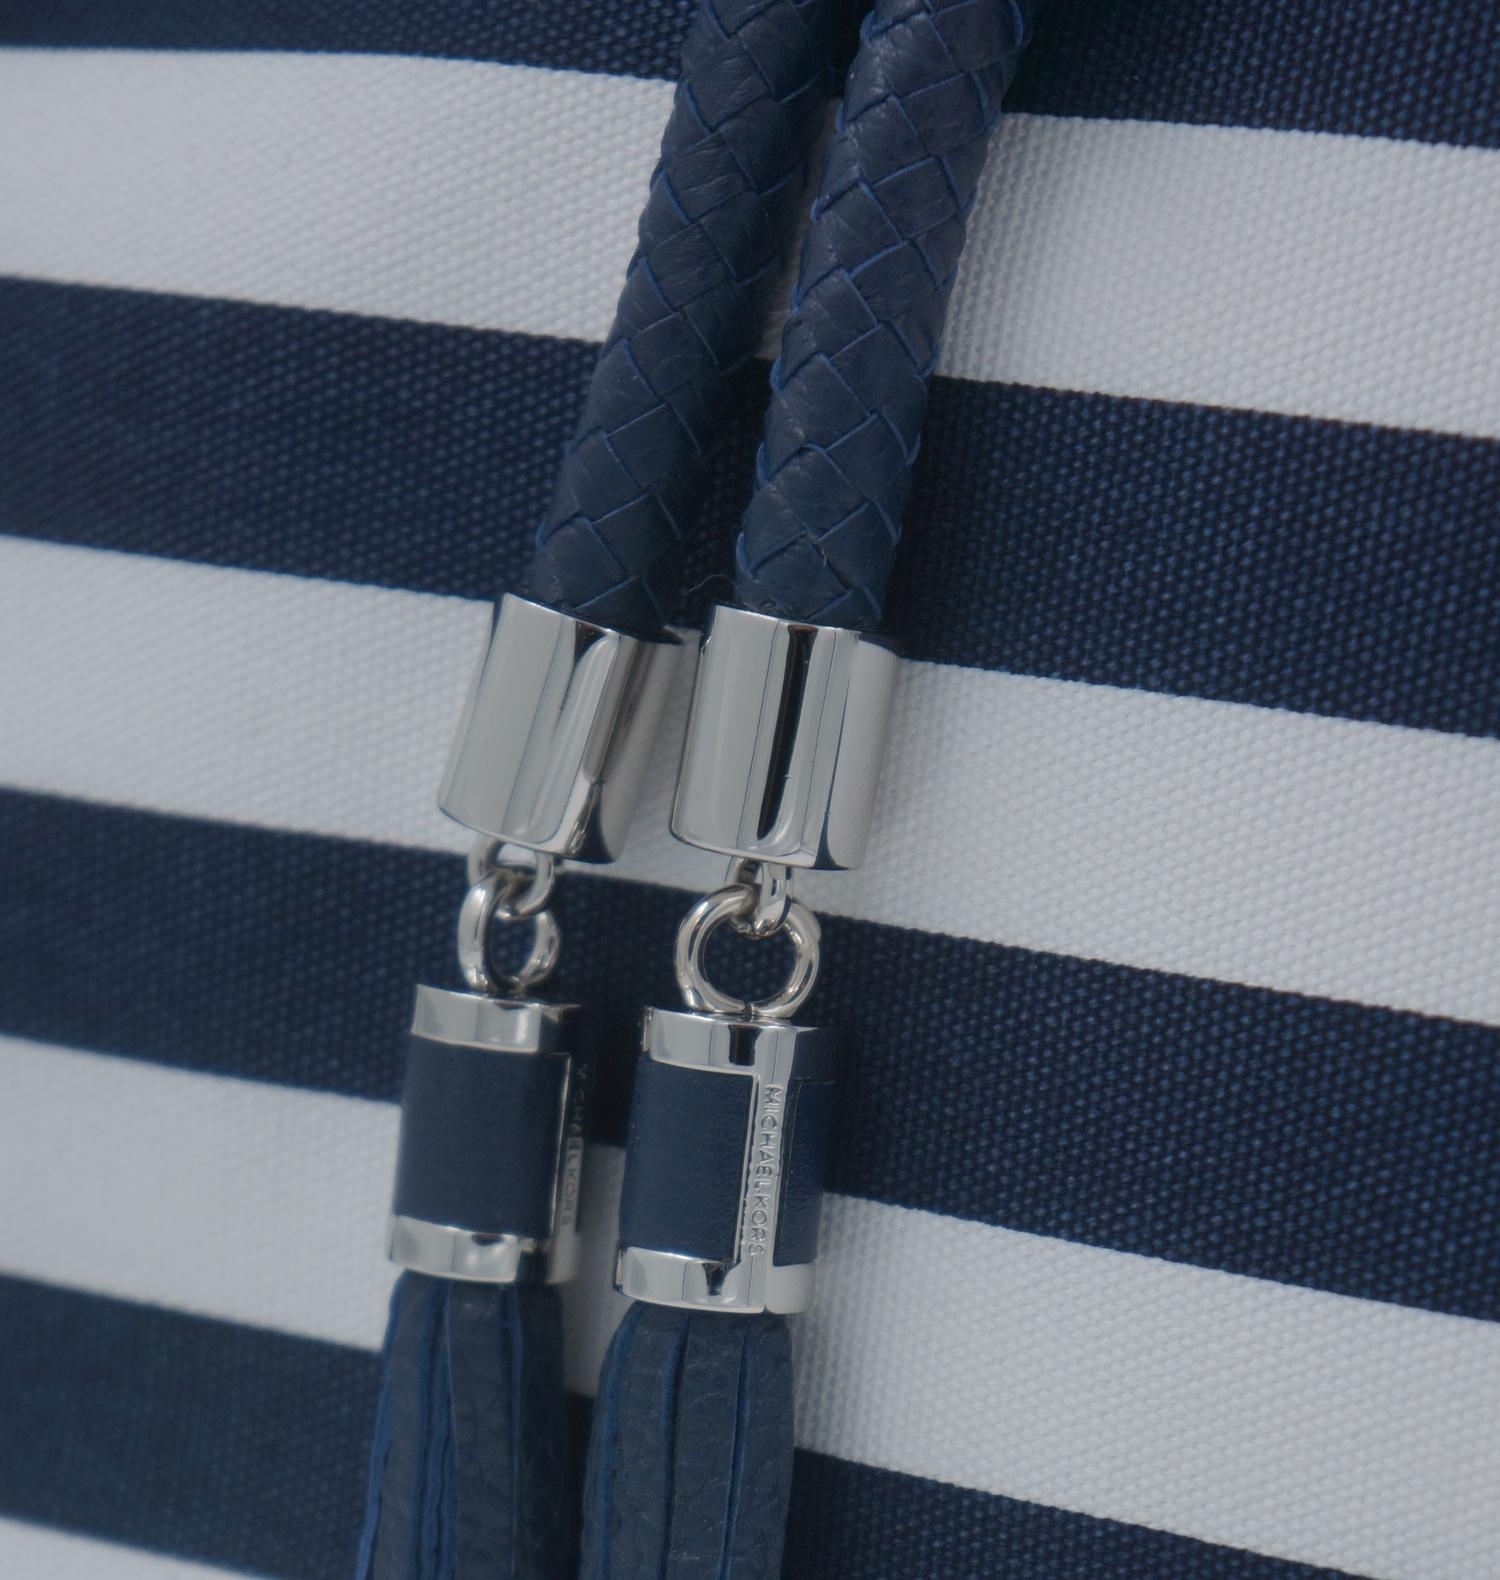 michael kors tasche marina lg navy weiss handtasche leder. Black Bedroom Furniture Sets. Home Design Ideas